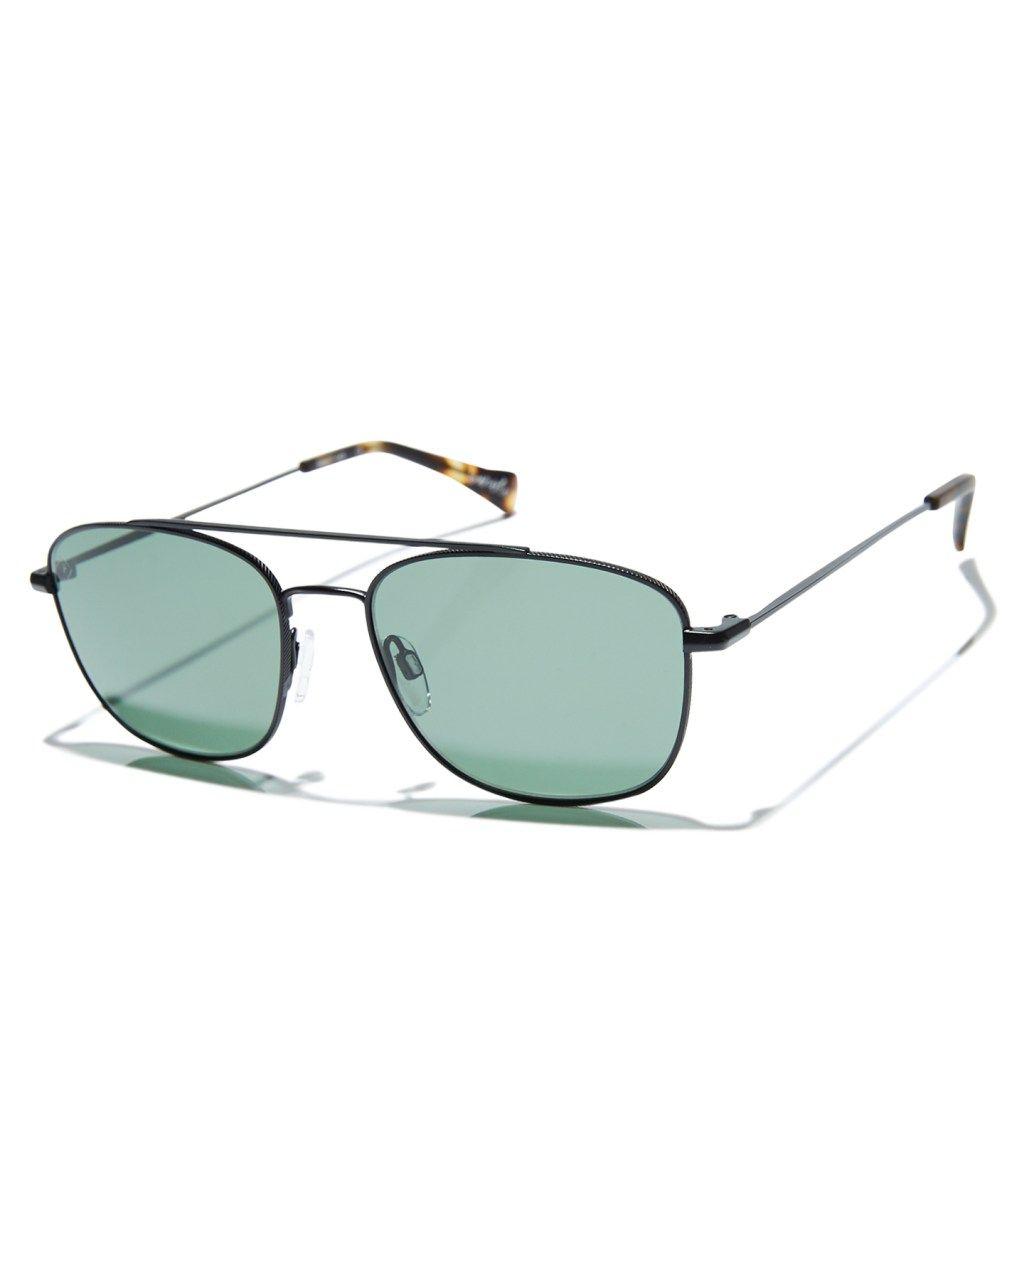 ec9cde4e3f9 Raen Barolo Polarized Sunglasses Black Matte Brindle Mens sunglasses Size